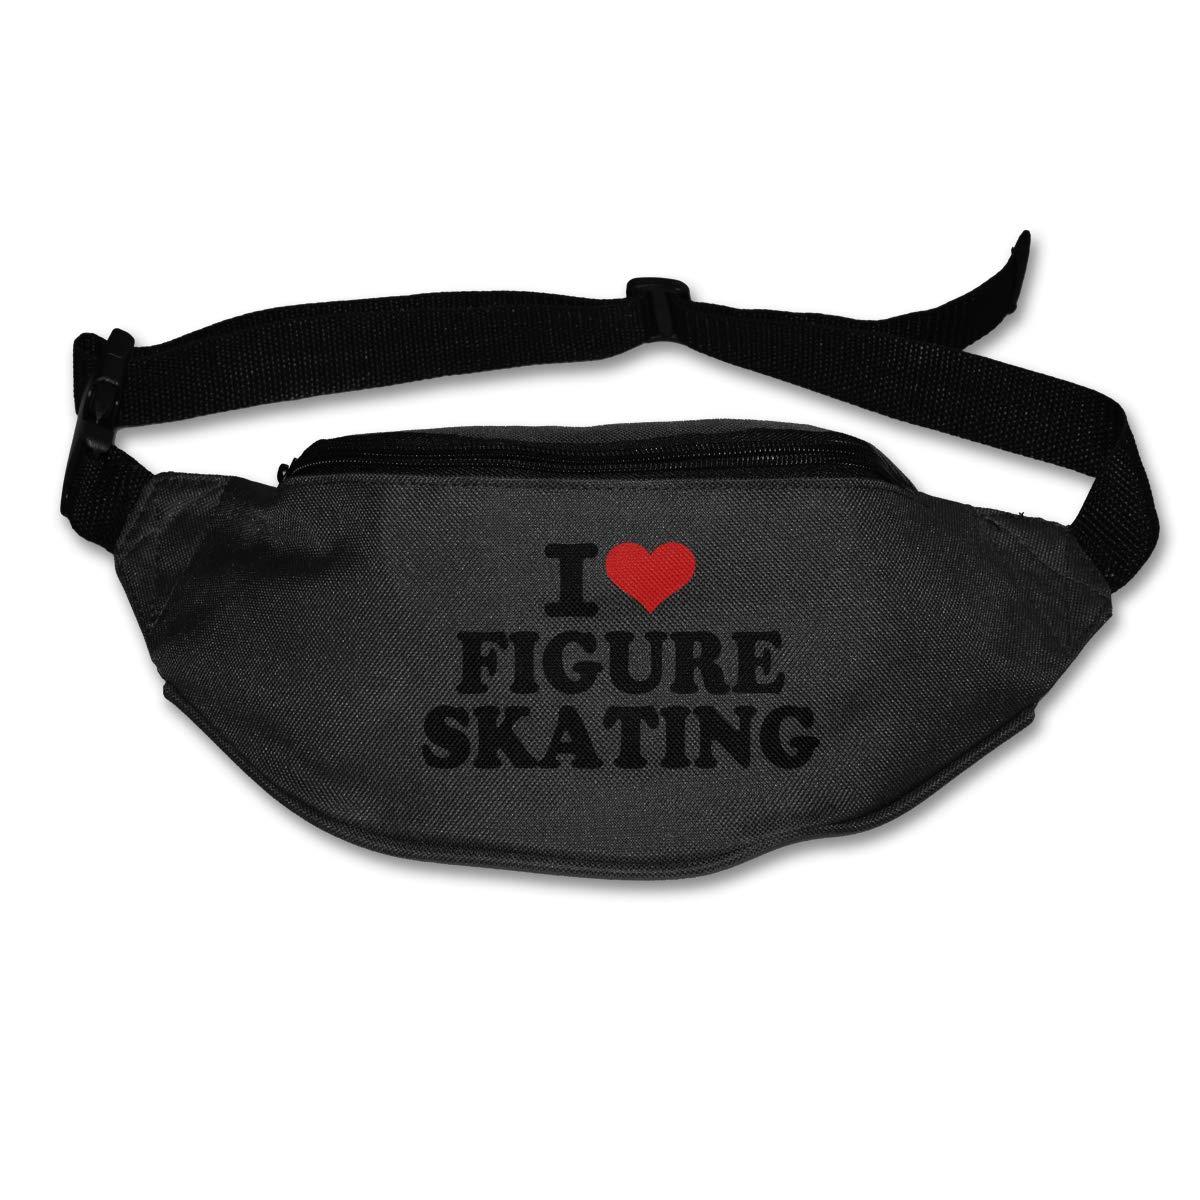 I Love Figure Skating Sport Waist Pack Fanny Pack Adjustable For Run